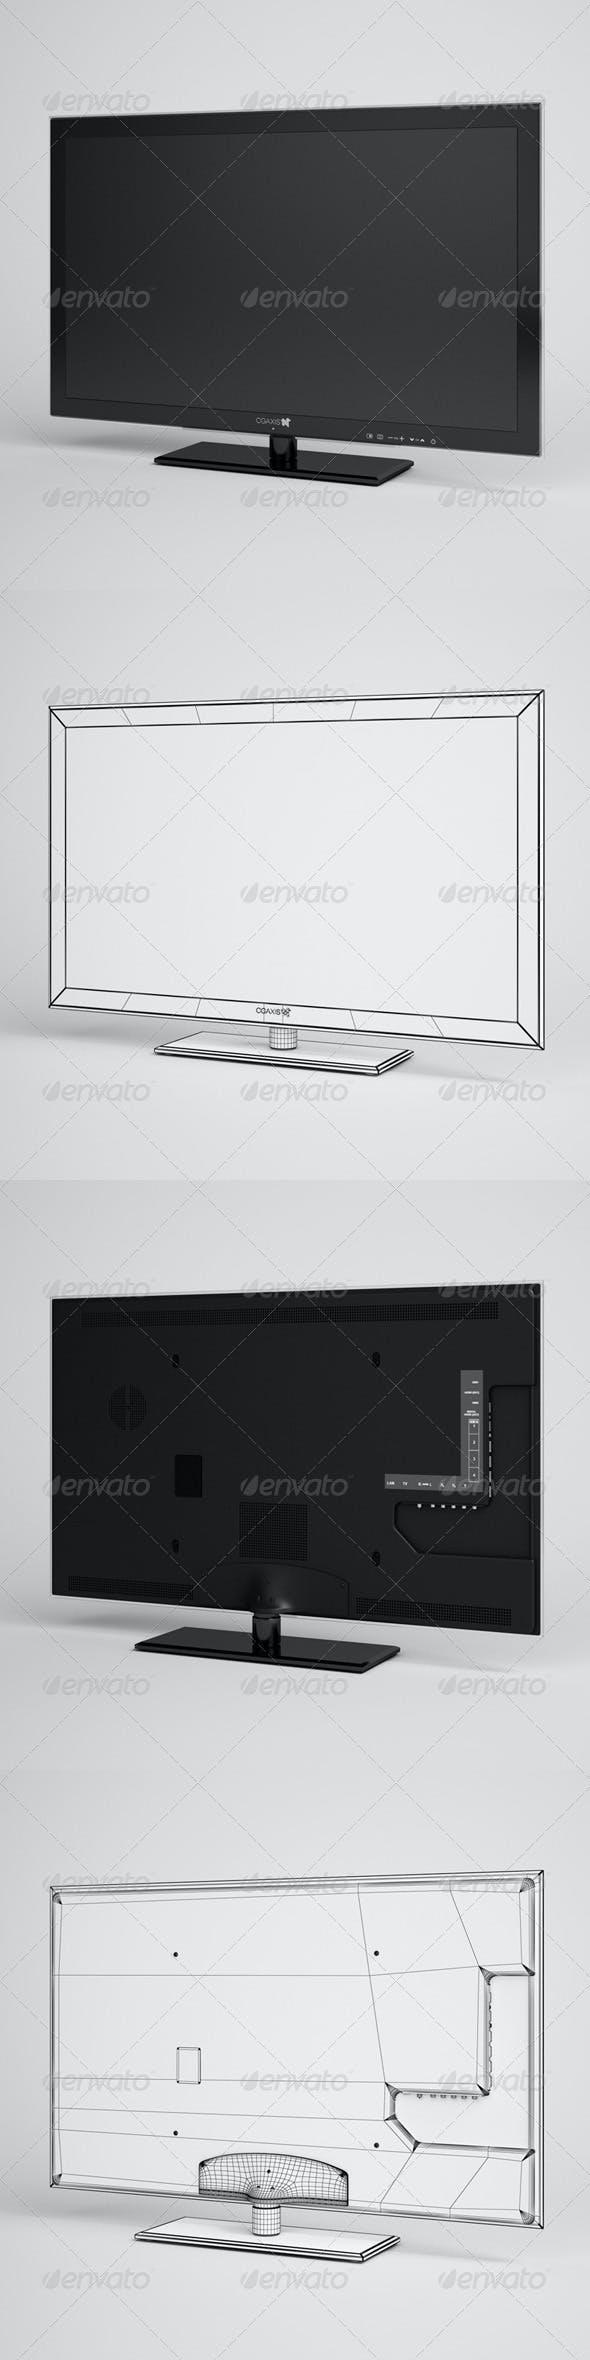 CGAxis TV Flatscreen Electronics 02 - 3DOcean Item for Sale